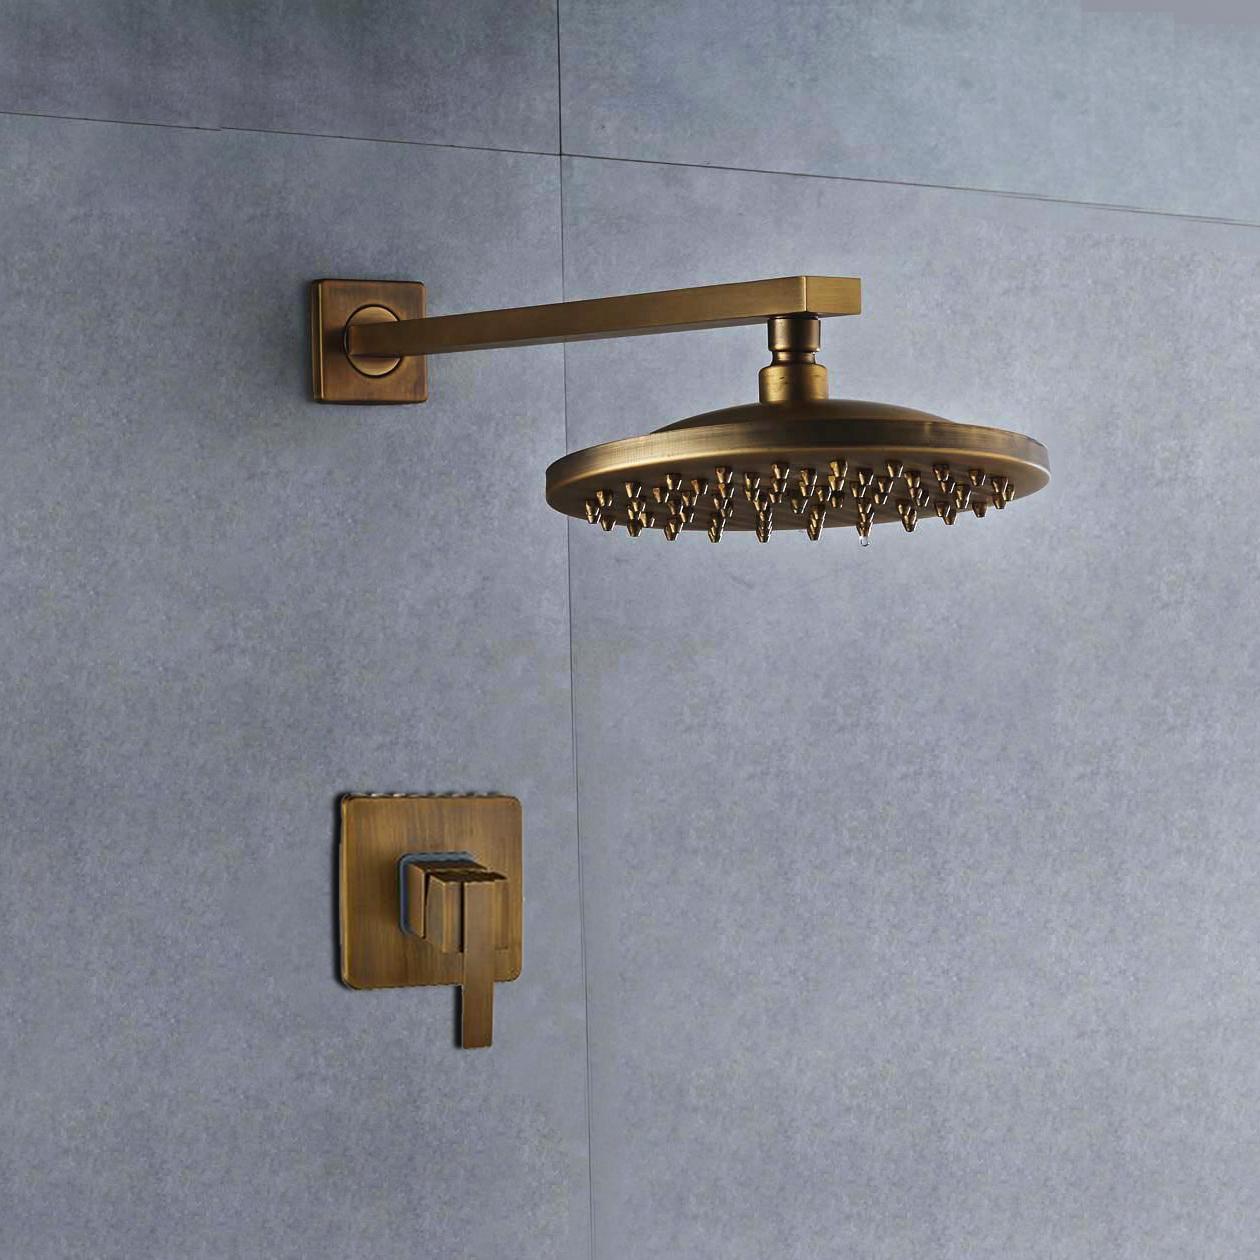 "BathSelect Ancient Round Antique Brass 8"" Rainfall Wall Shower Head"